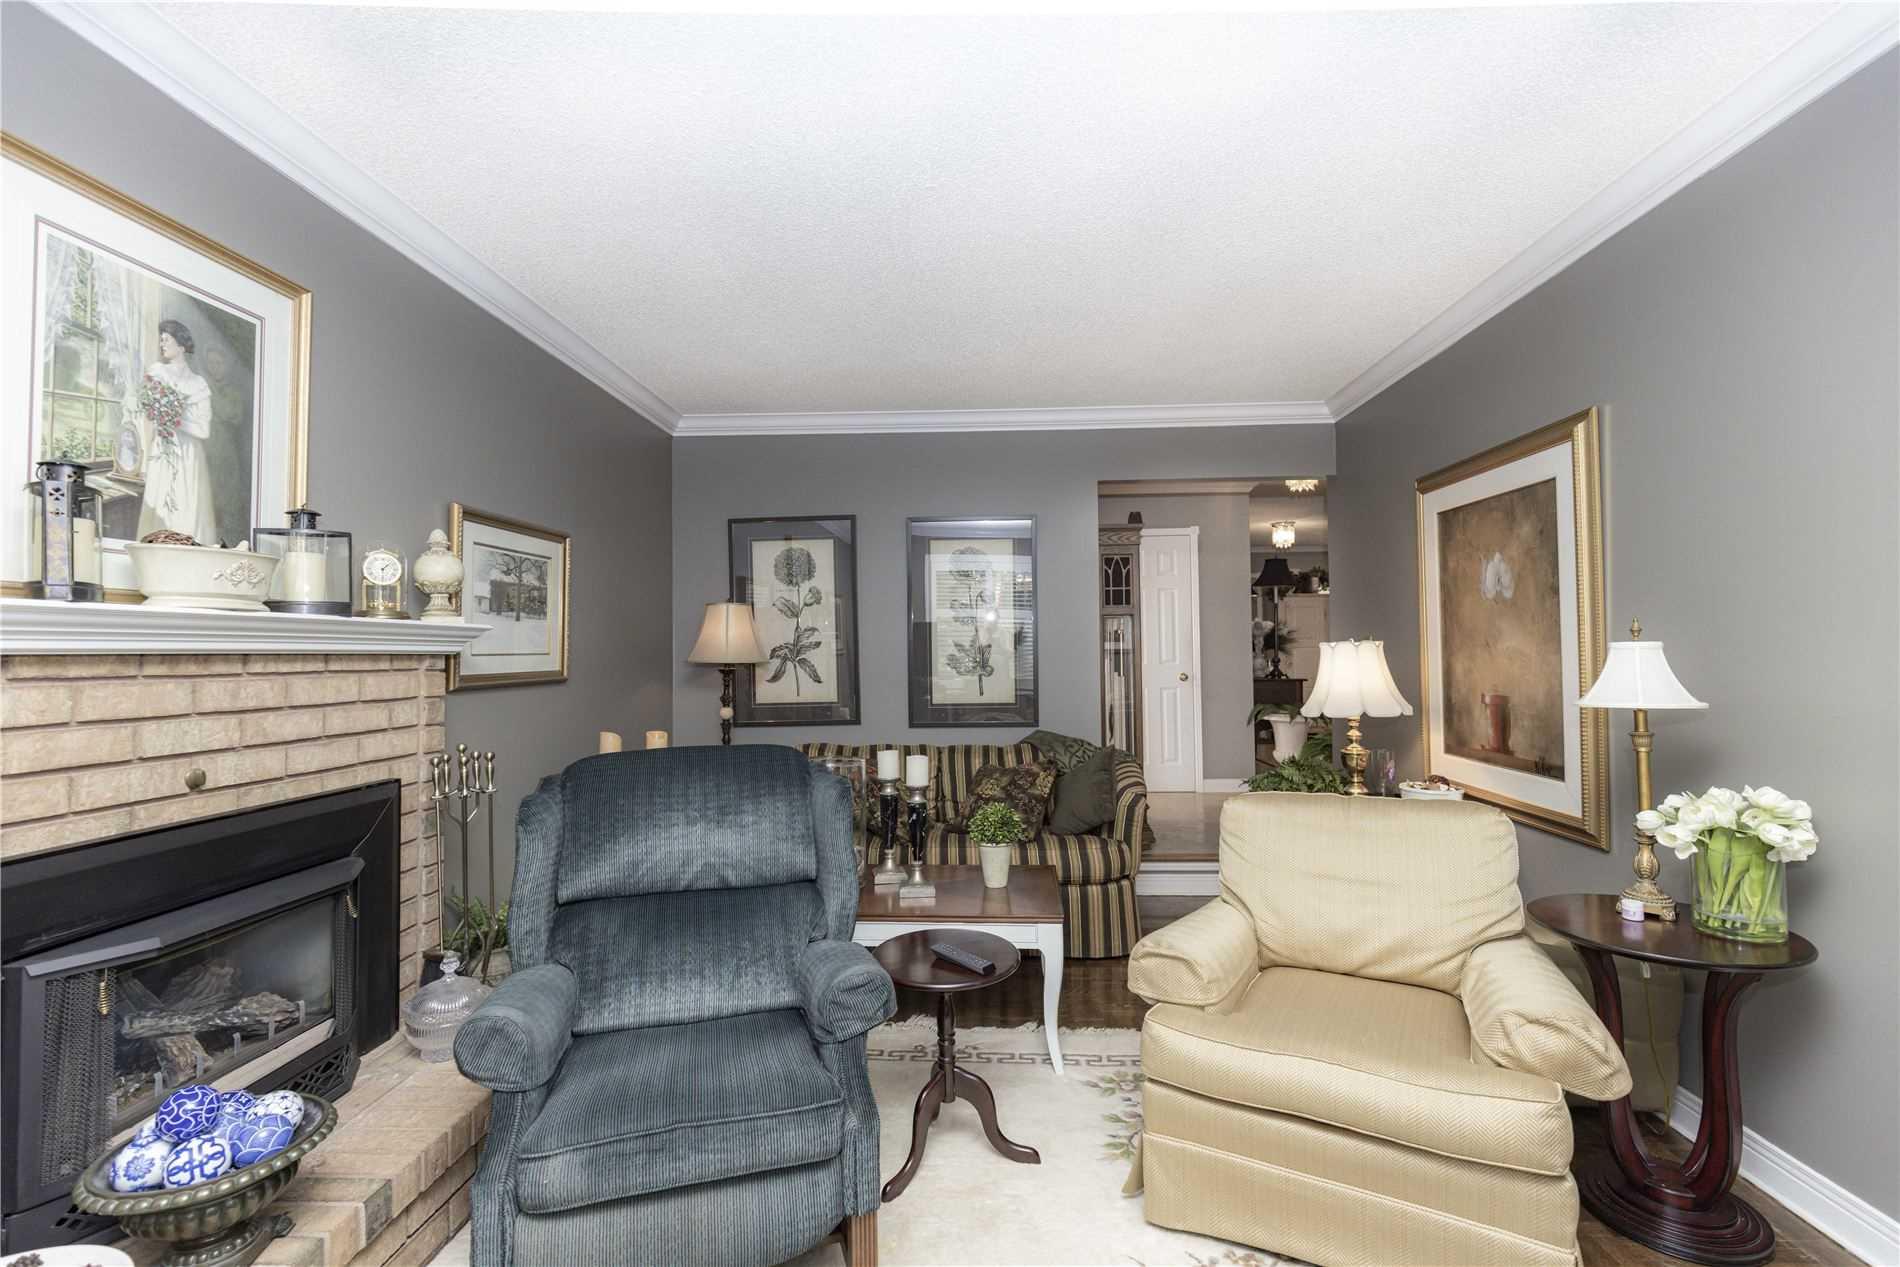 6 Jamieson Cres, Whitby, Ontario L1R 1V2, 4 Bedrooms Bedrooms, 11 Rooms Rooms,4 BathroomsBathrooms,Detached,For Sale,Jamieson,E5354675